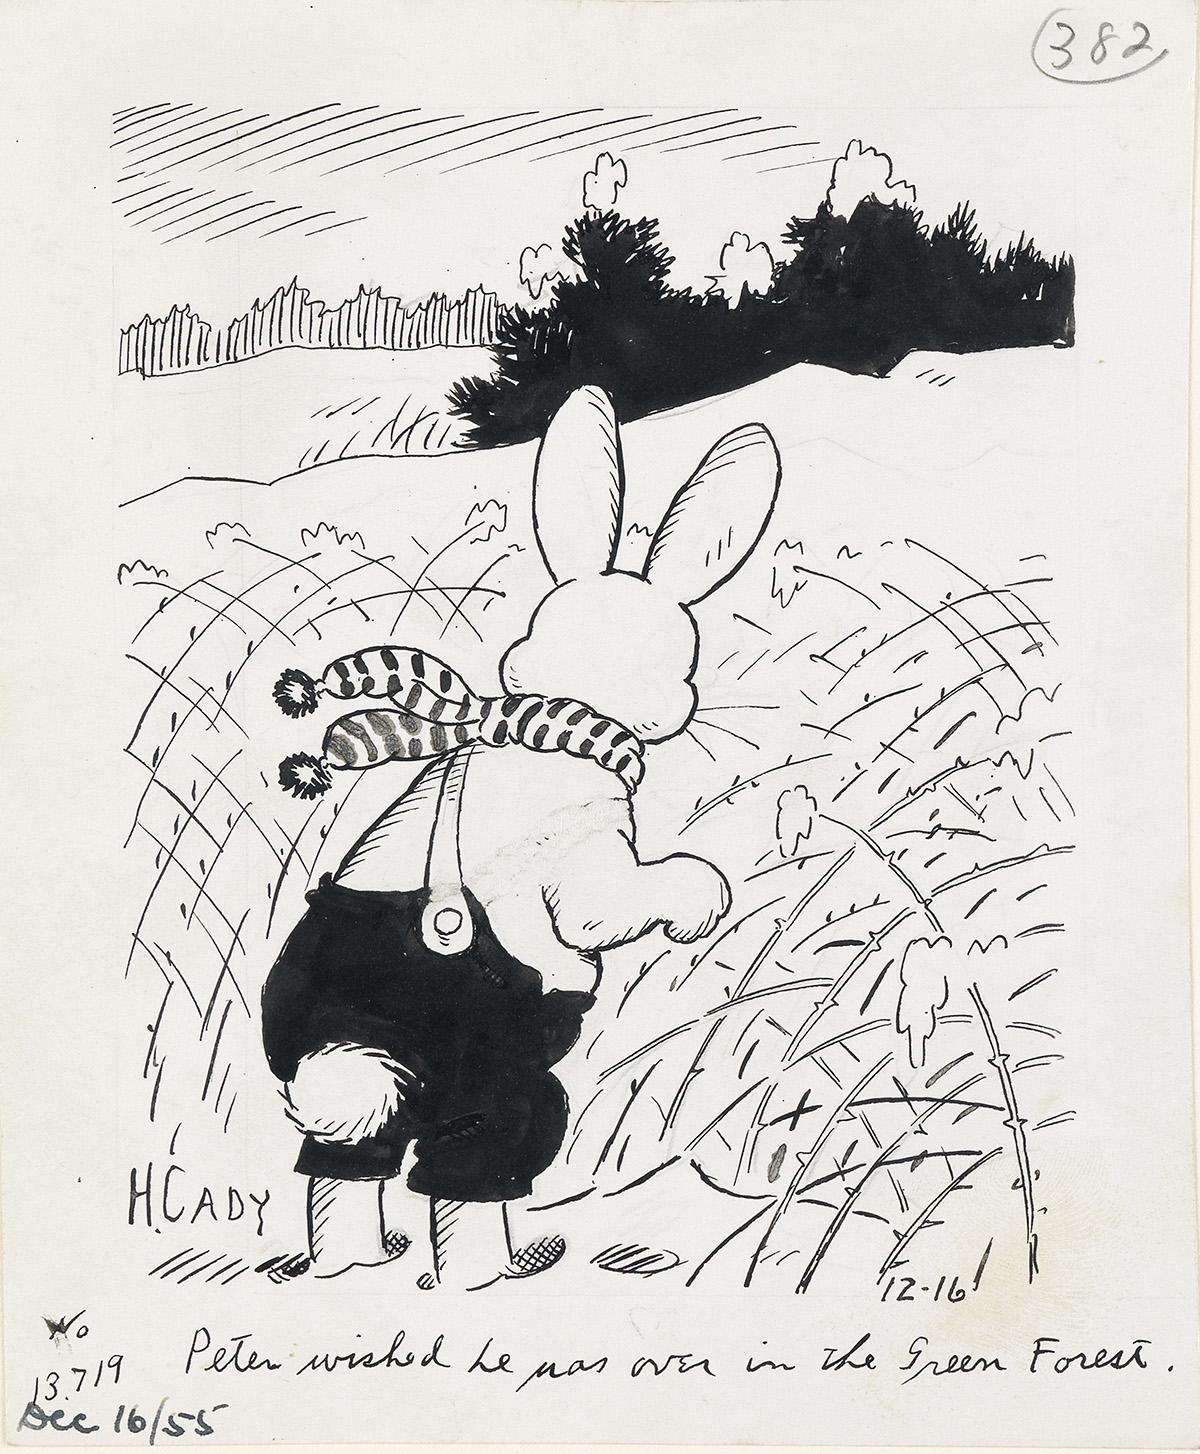 HARRISON-CADY-Burgess-Bedtime-Stories